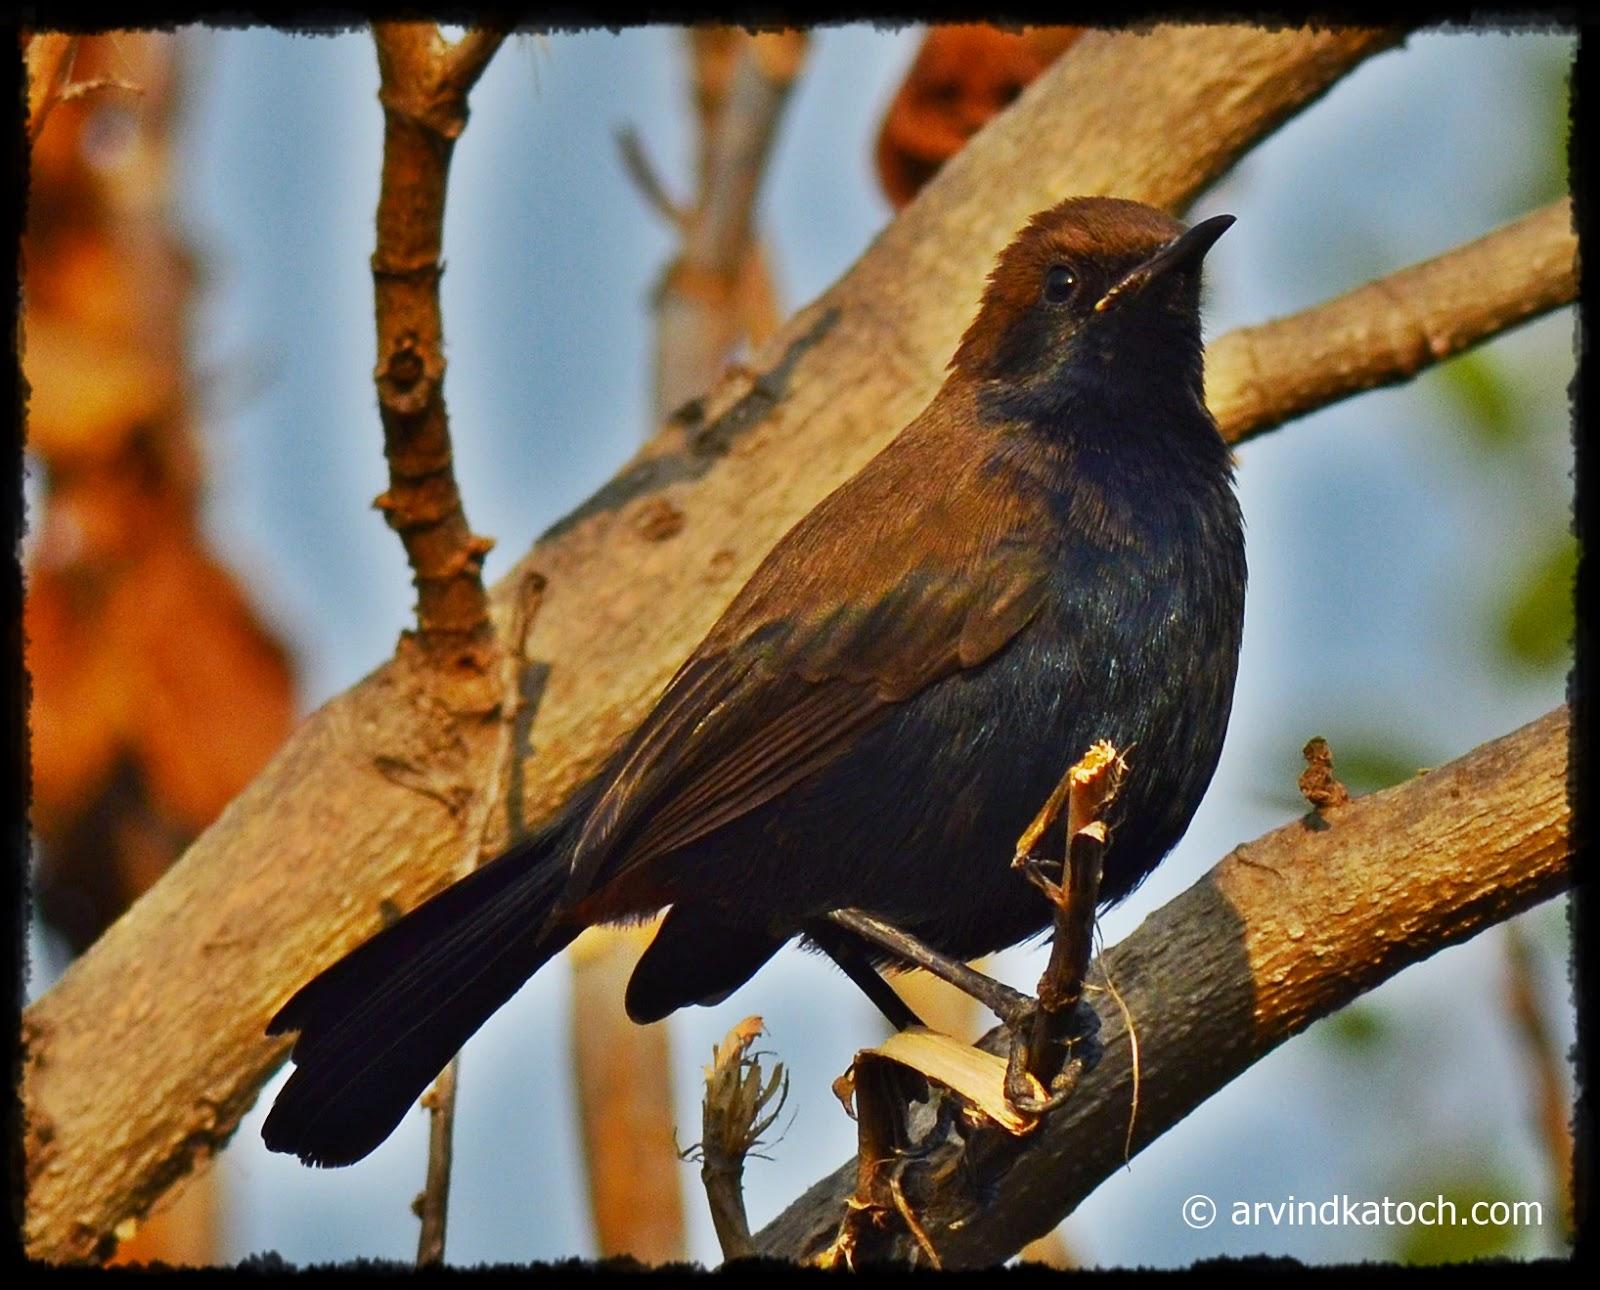 Brown Headed Bird, Navy Blue Chest, Small Bird, Punjab